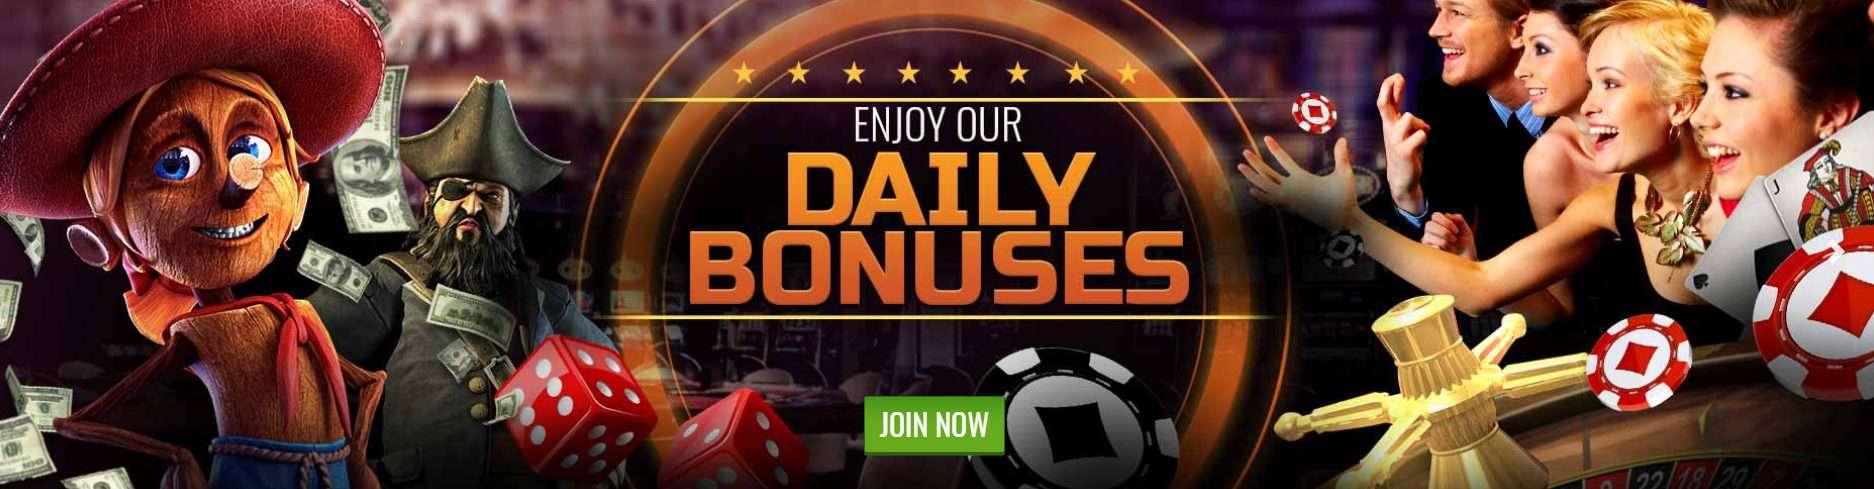 MyBookie Casino Bonuses